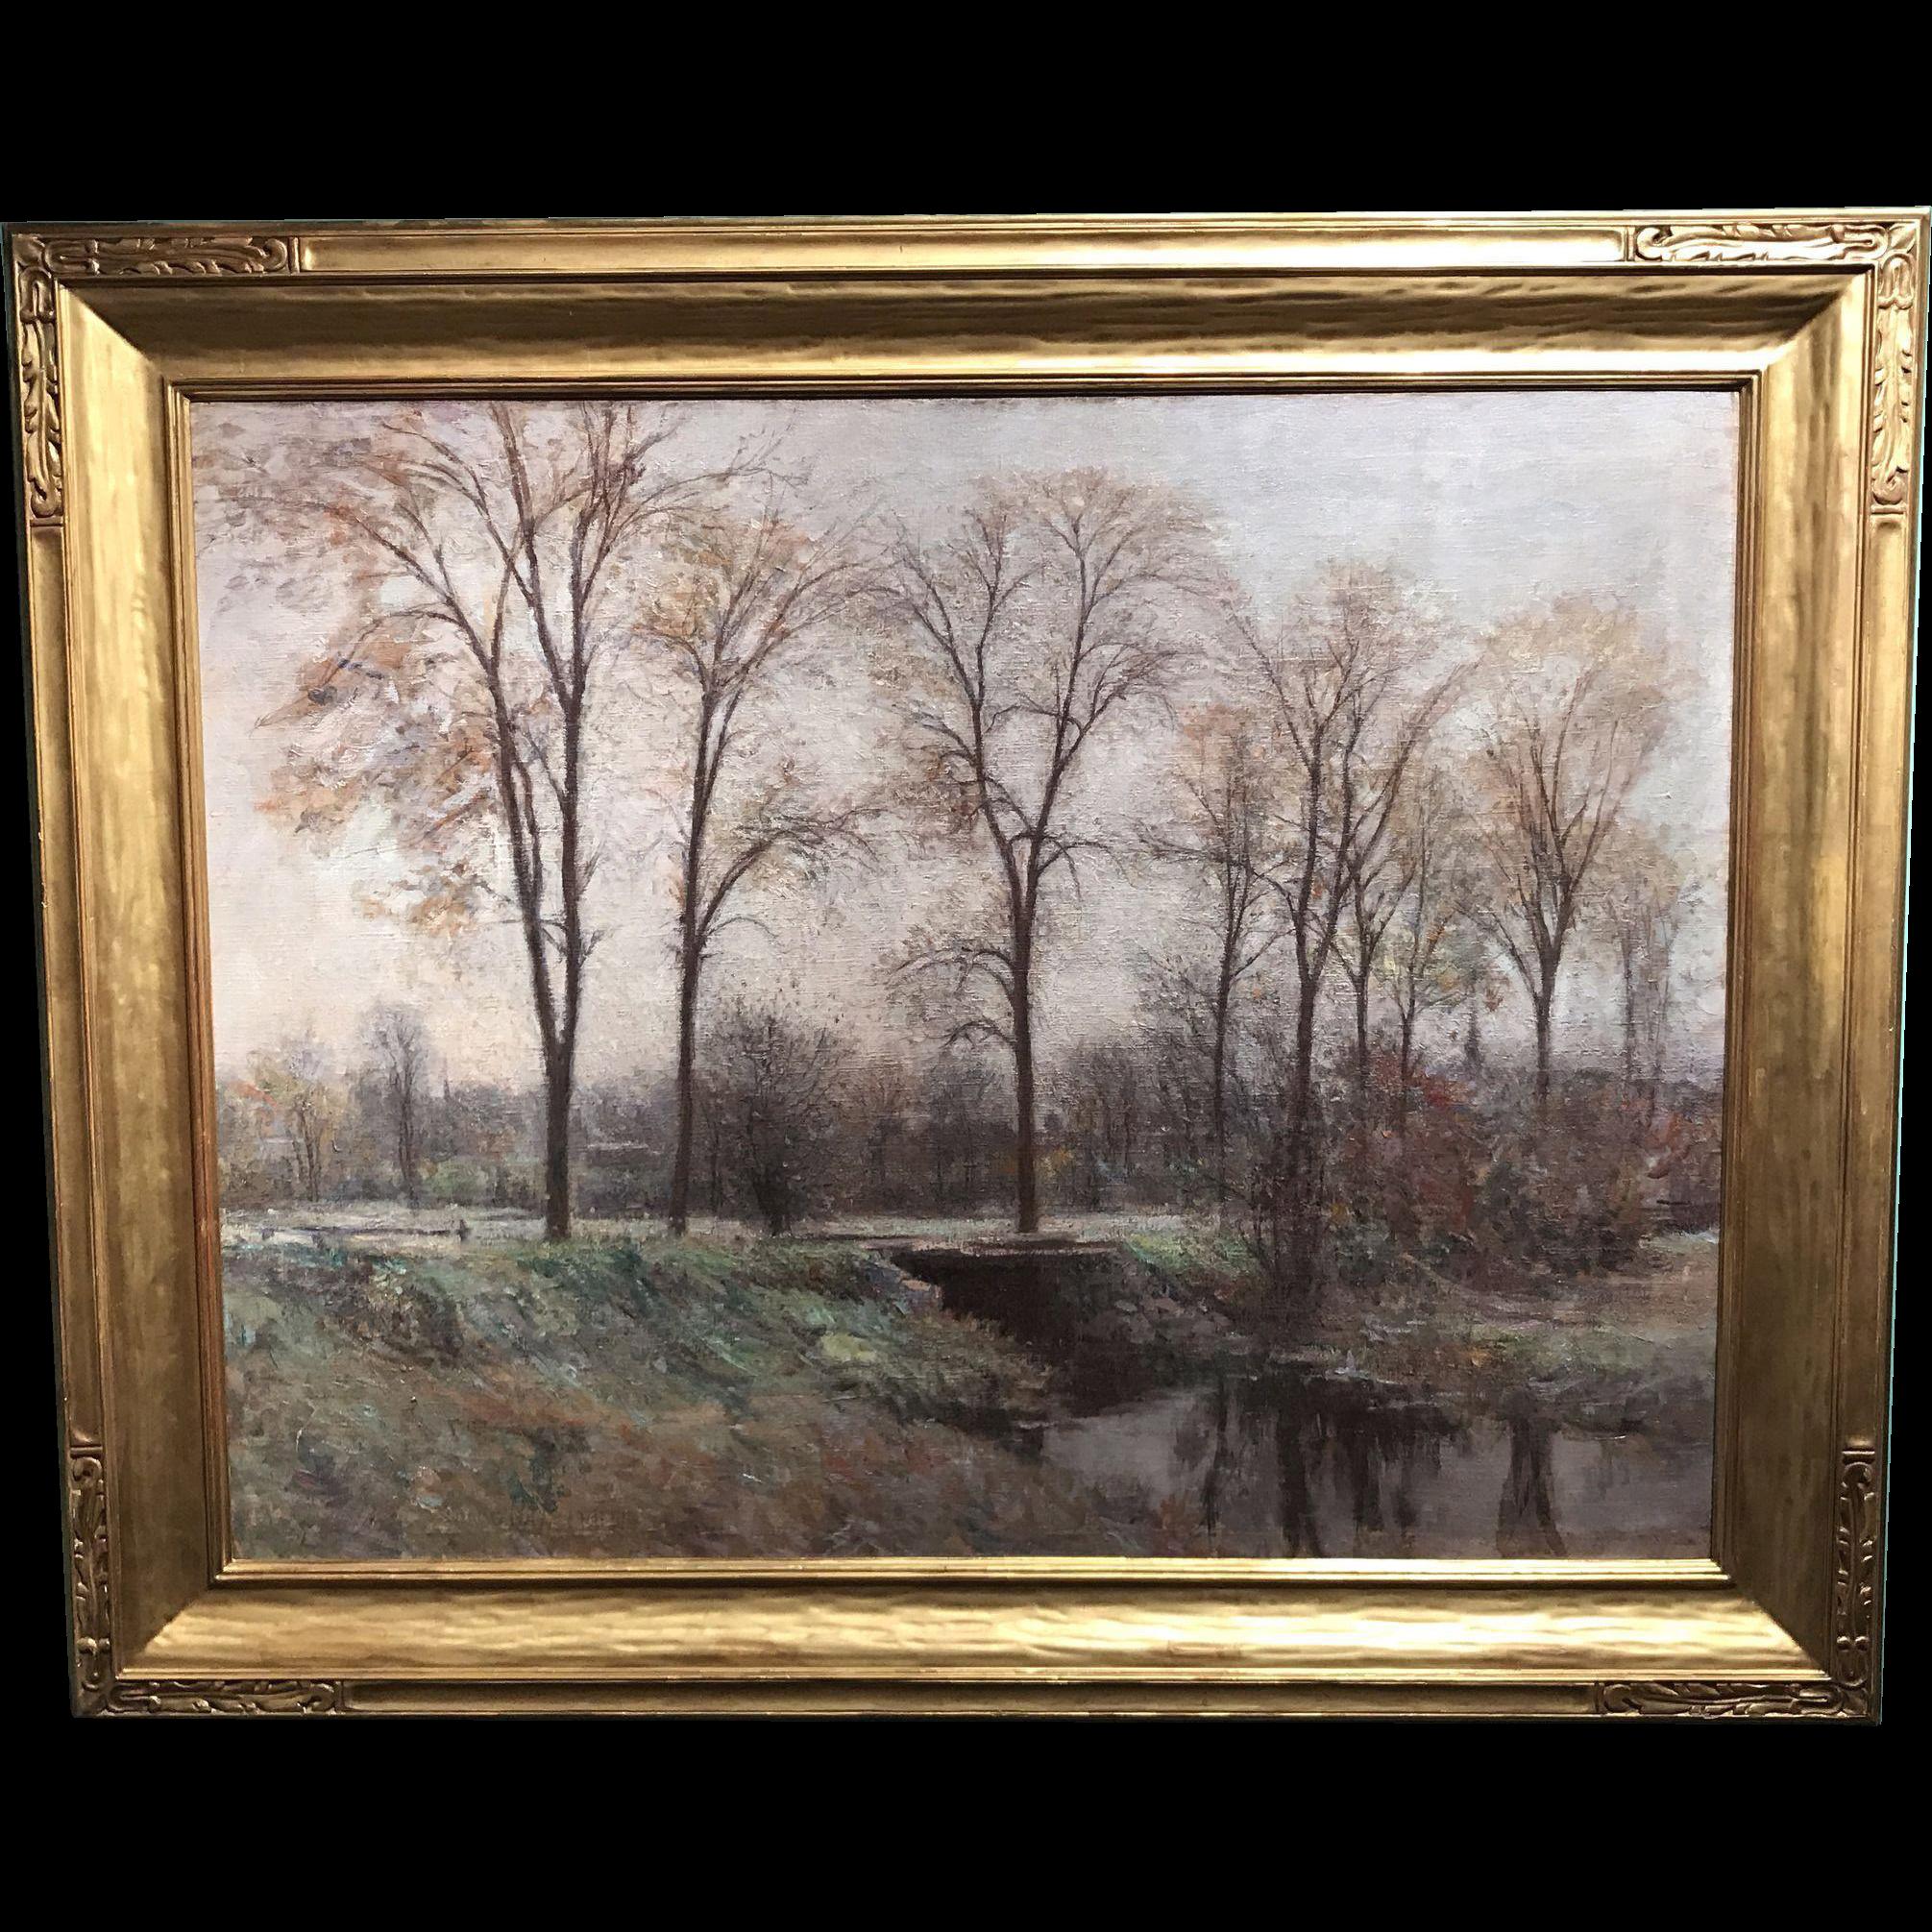 Edward Wilbur Dean Hamilton Oil Painting of The Fens, Boston Massachusetts